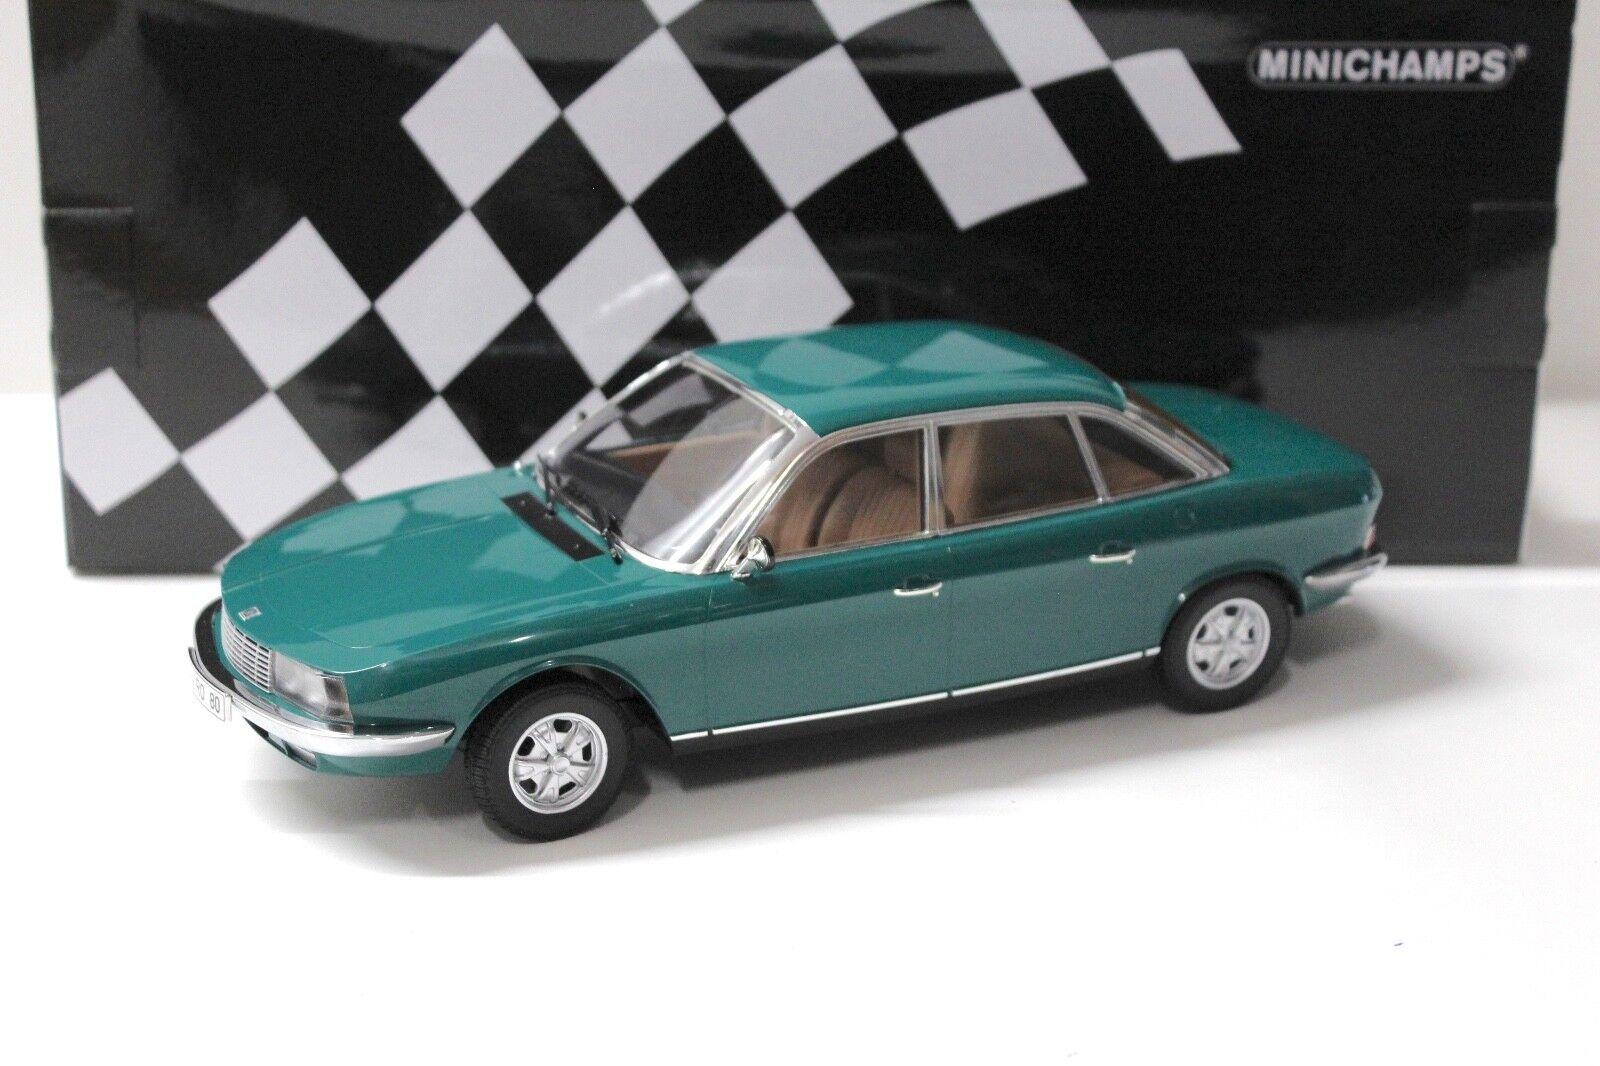 1 18 Minichamps Audi NSU RO 80 vert 1972 New chez Premium-modelcars